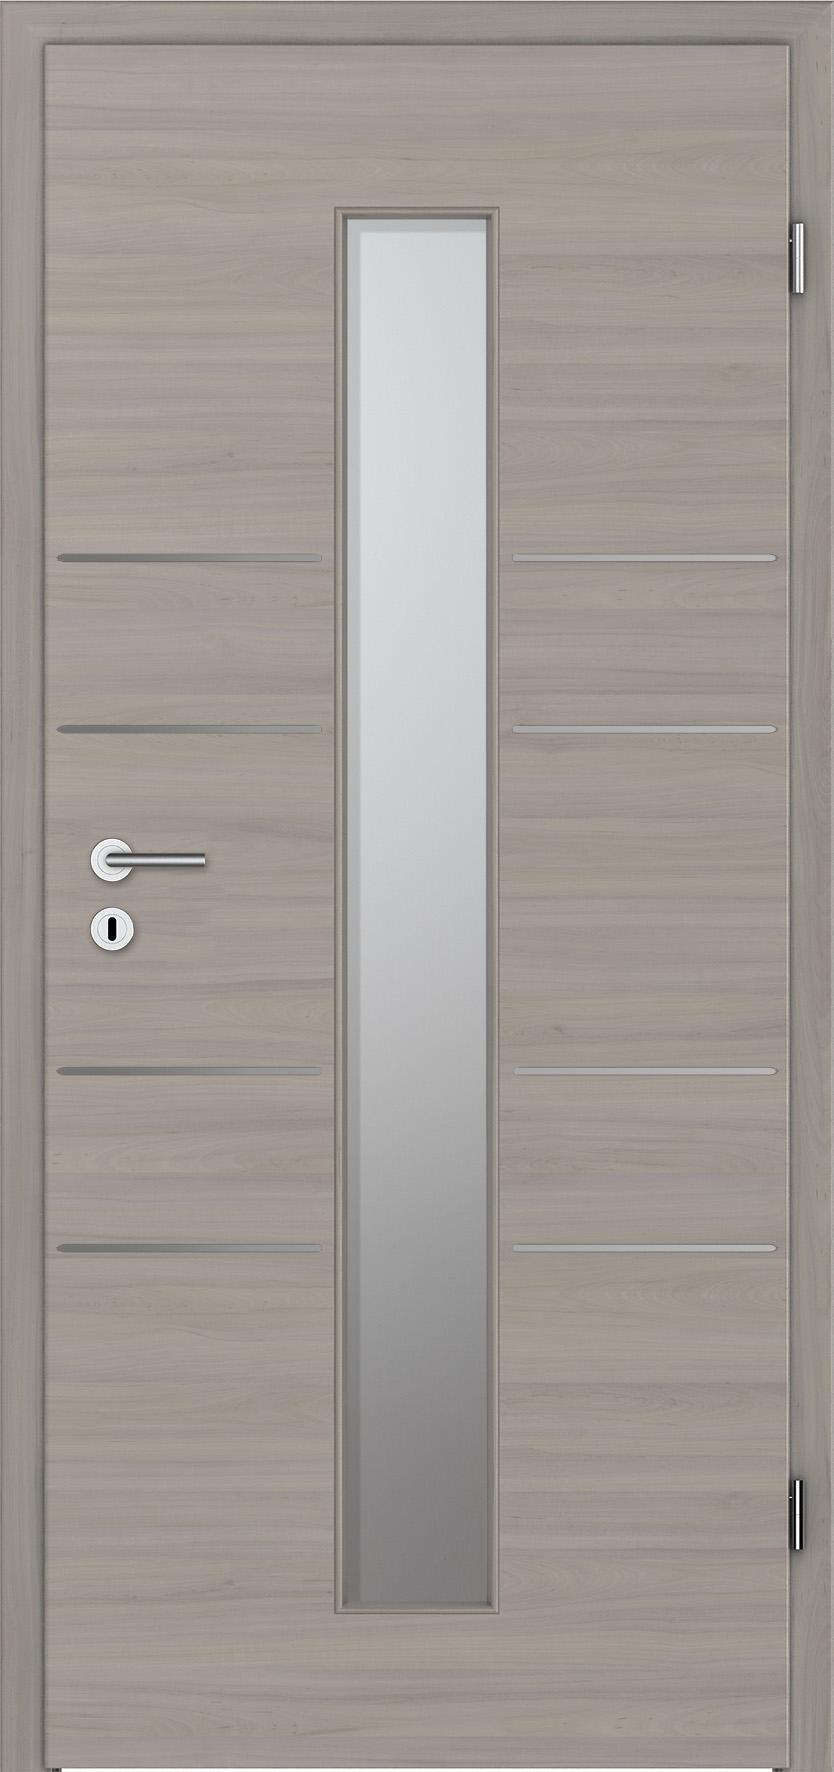 RY-553-LA2 CPL Pera Grey DQ